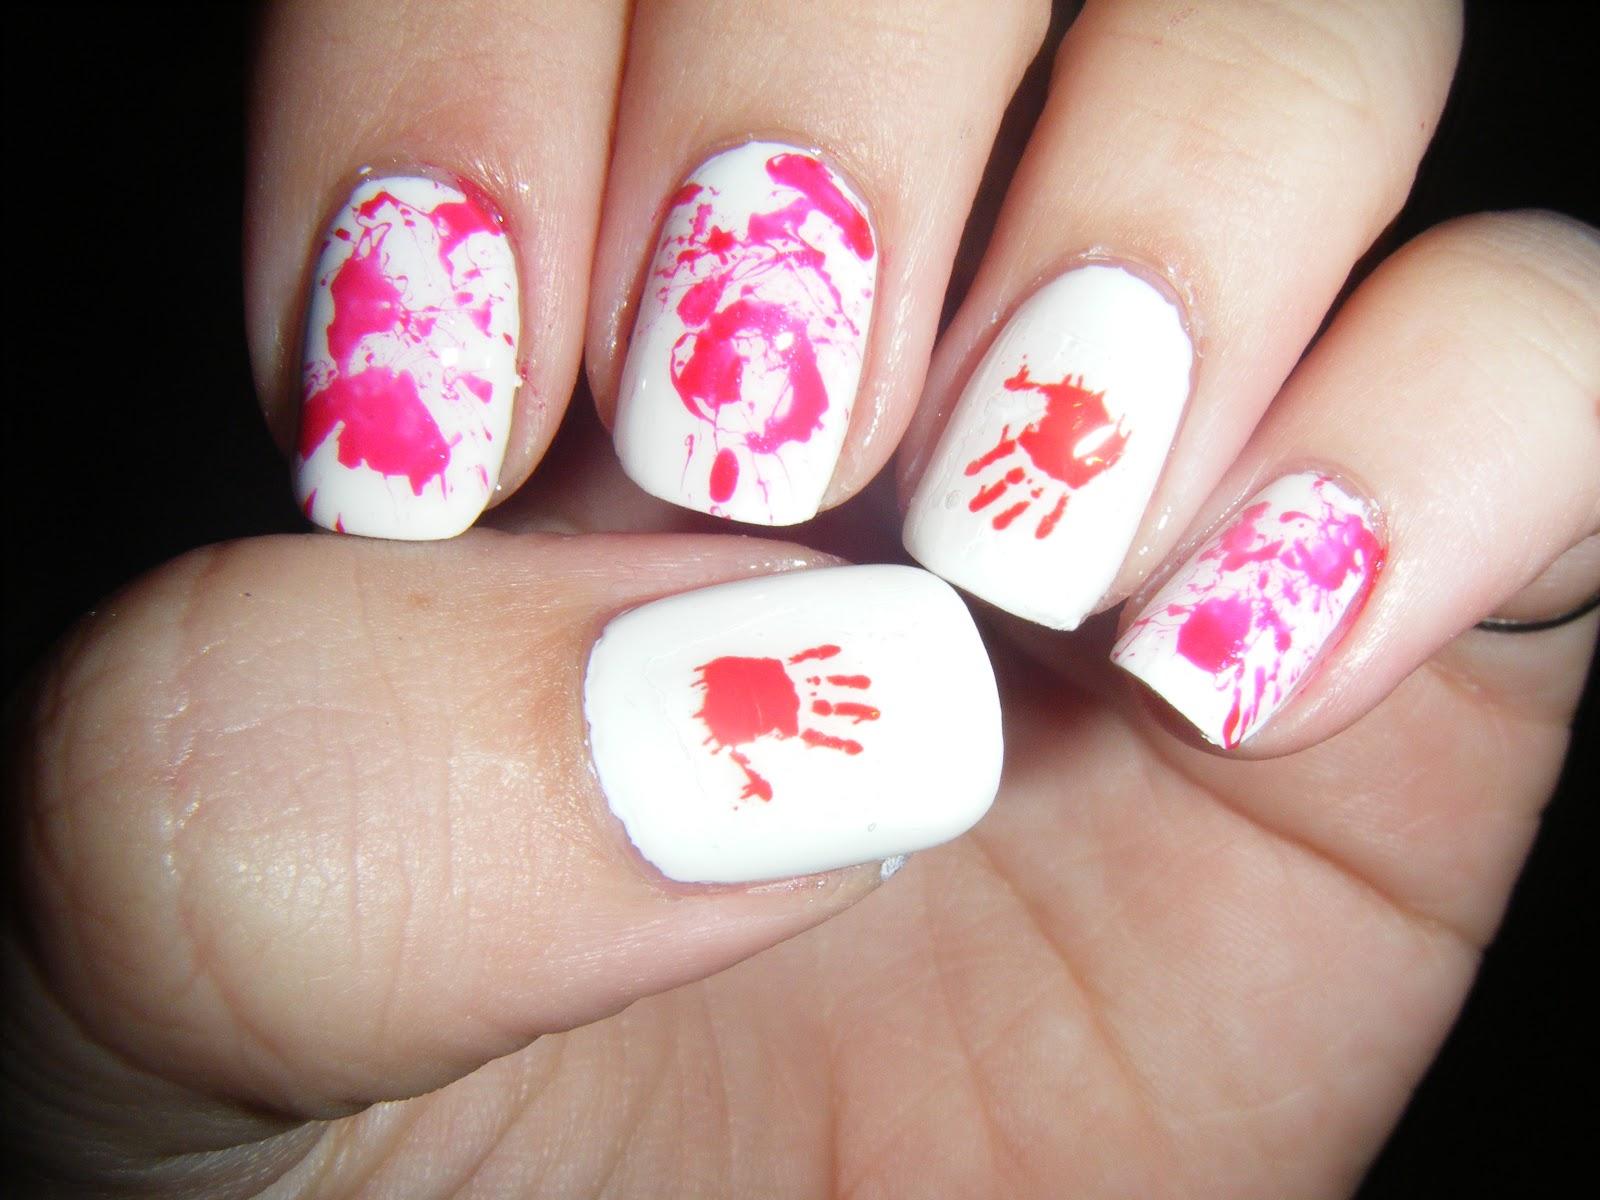 No Nekkid Nails Blood Splatter